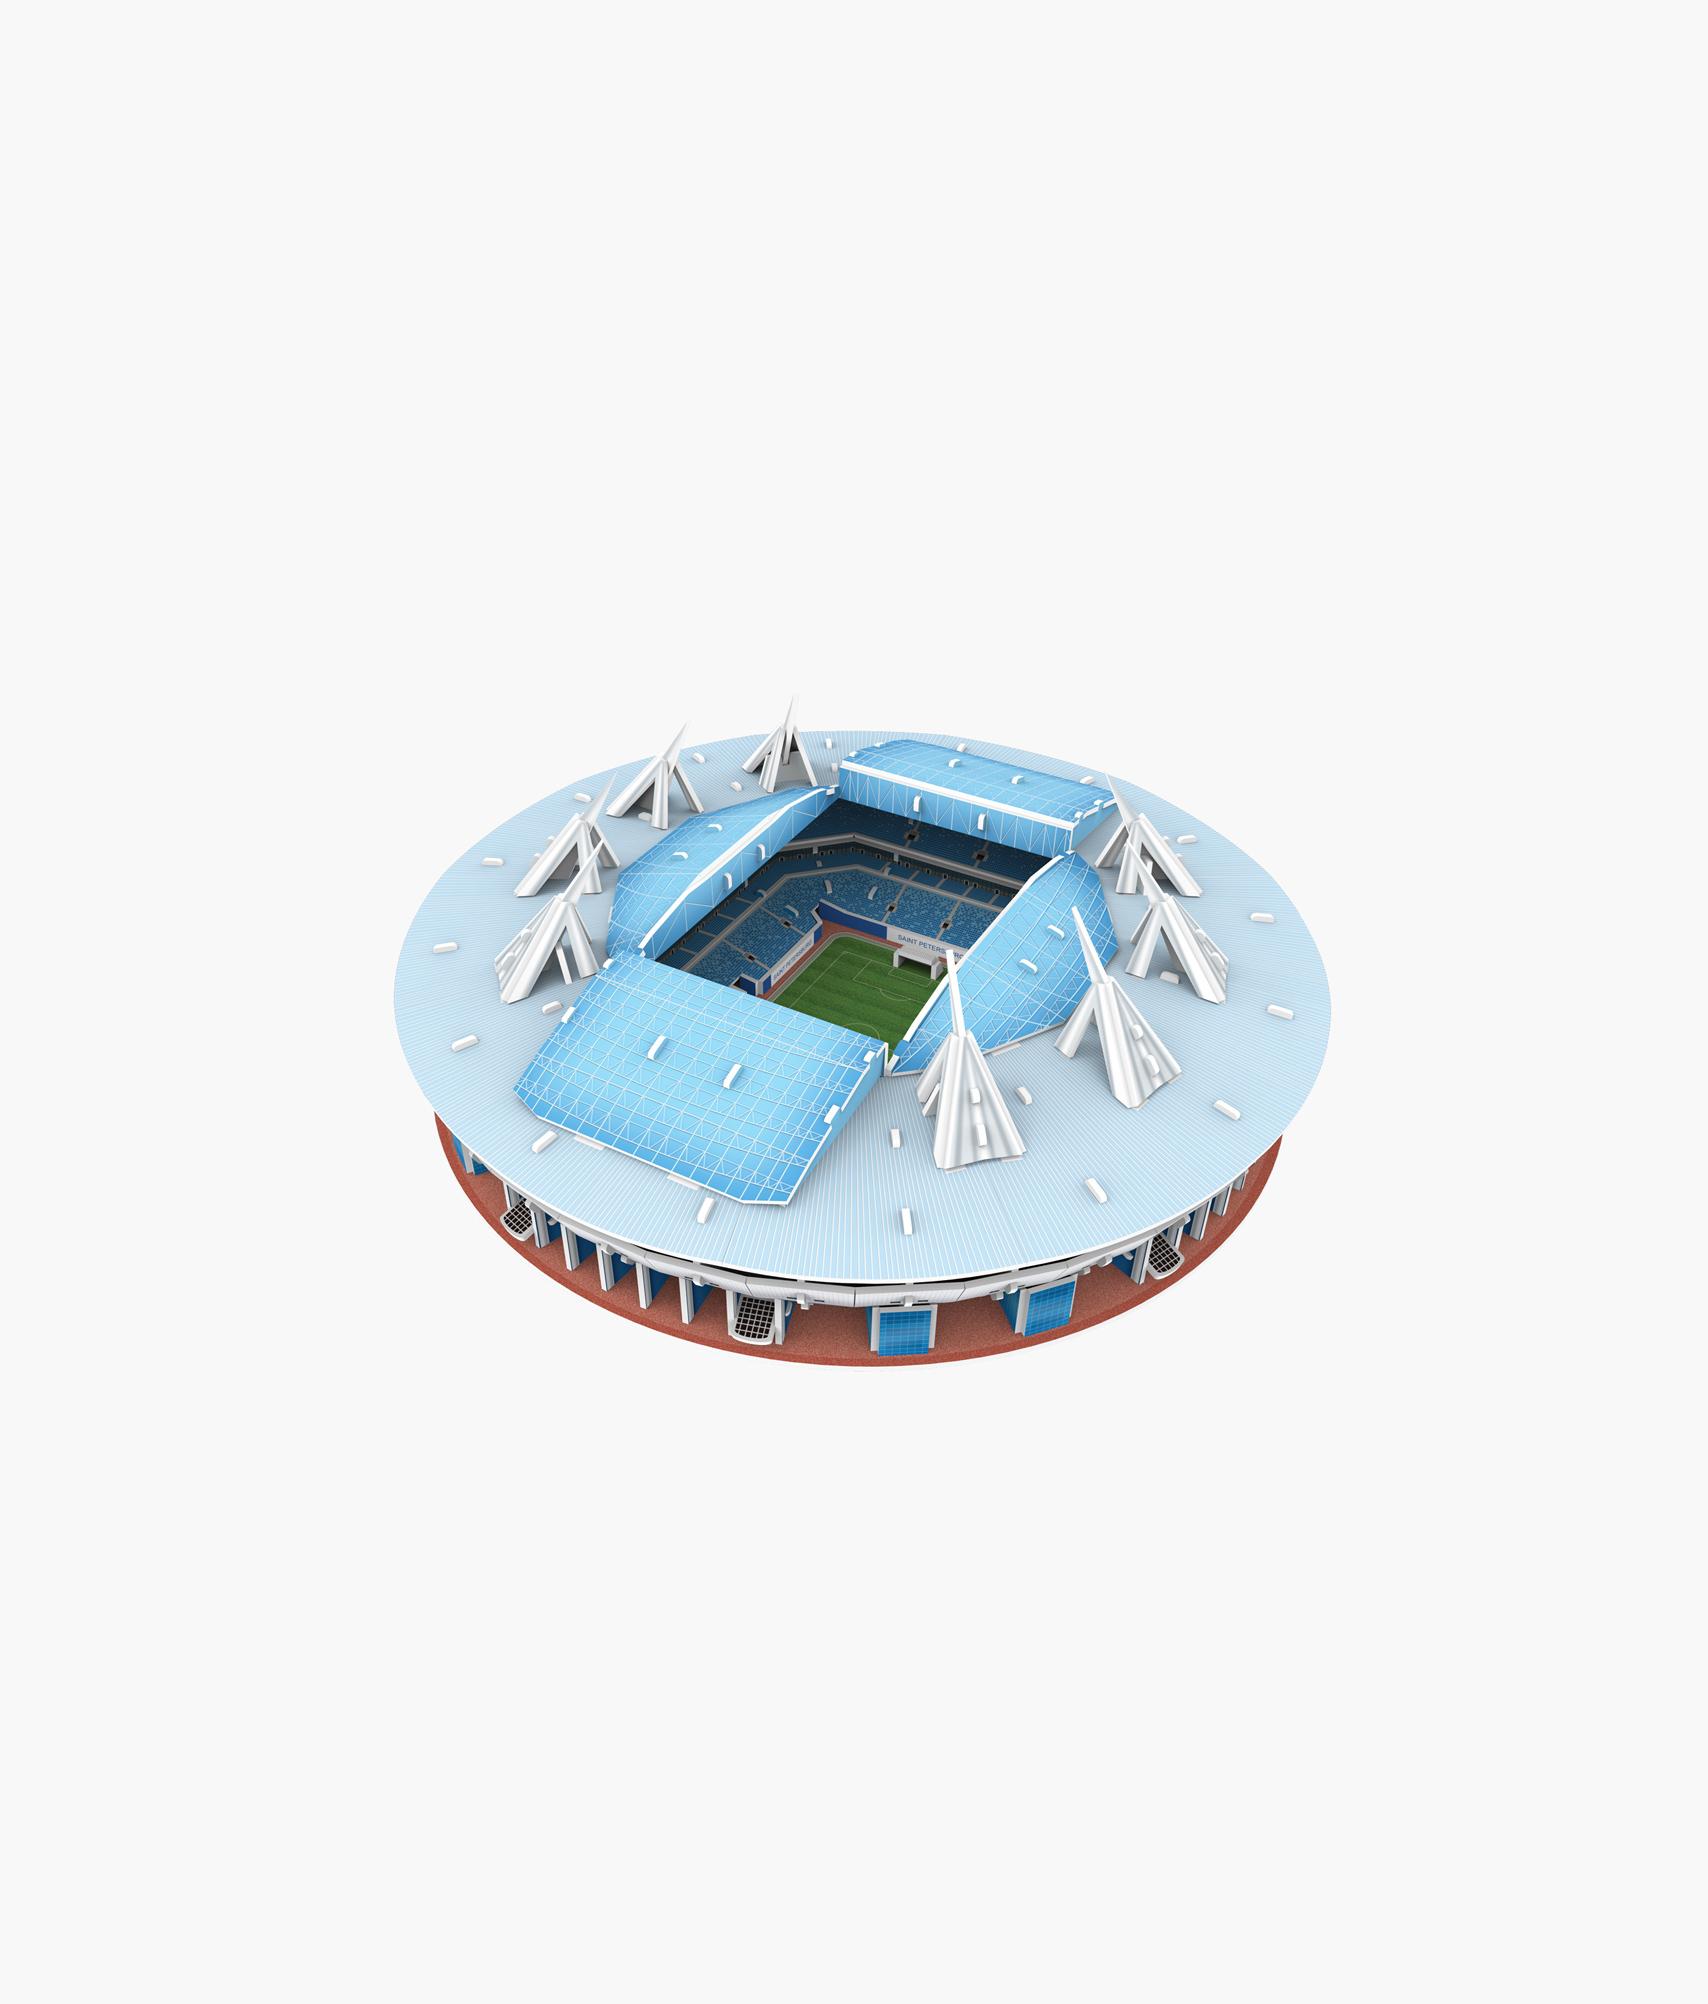 Пазл 3D Стадион «Санкт-Петербург» Зенит цена в Москве и Питере